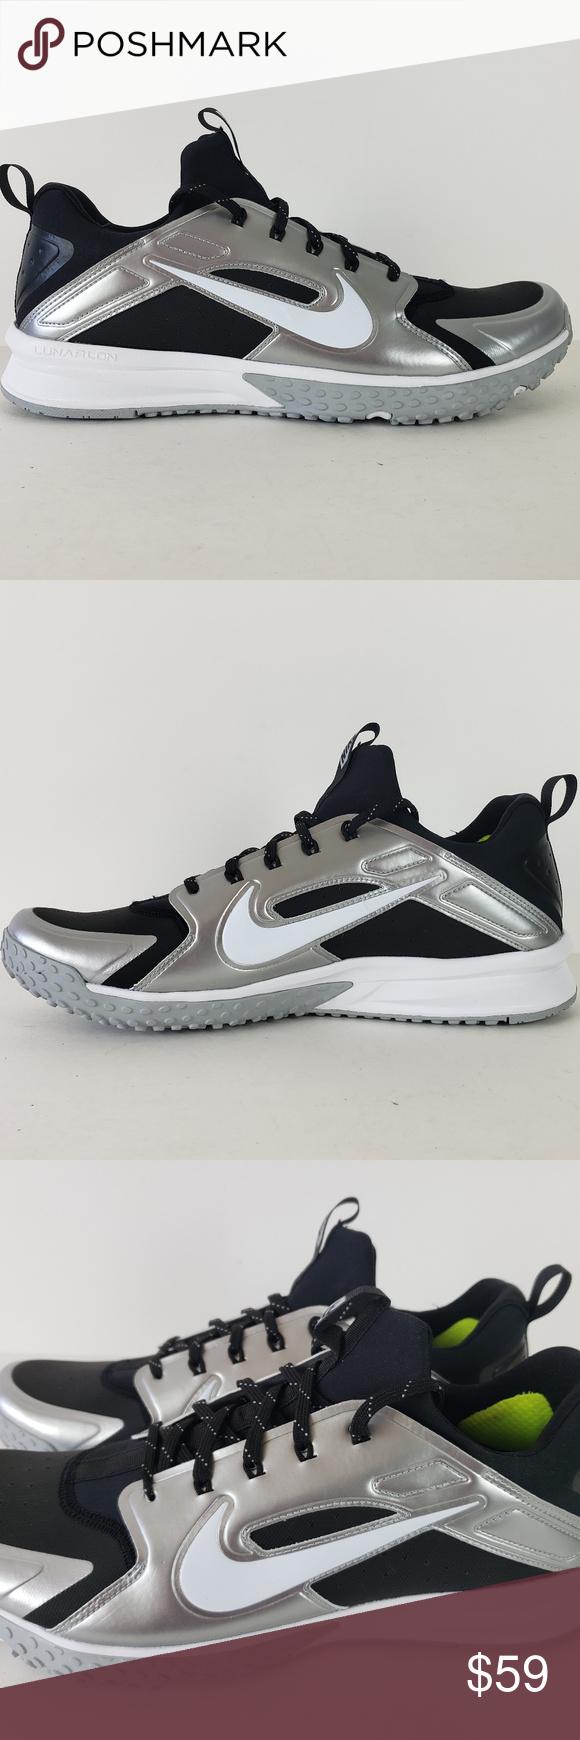 49bdfd4d6b317 Nike Huarache Turf Baseball Shoes Size 13 NEW This is an 100% Authentic Nike  Huarache